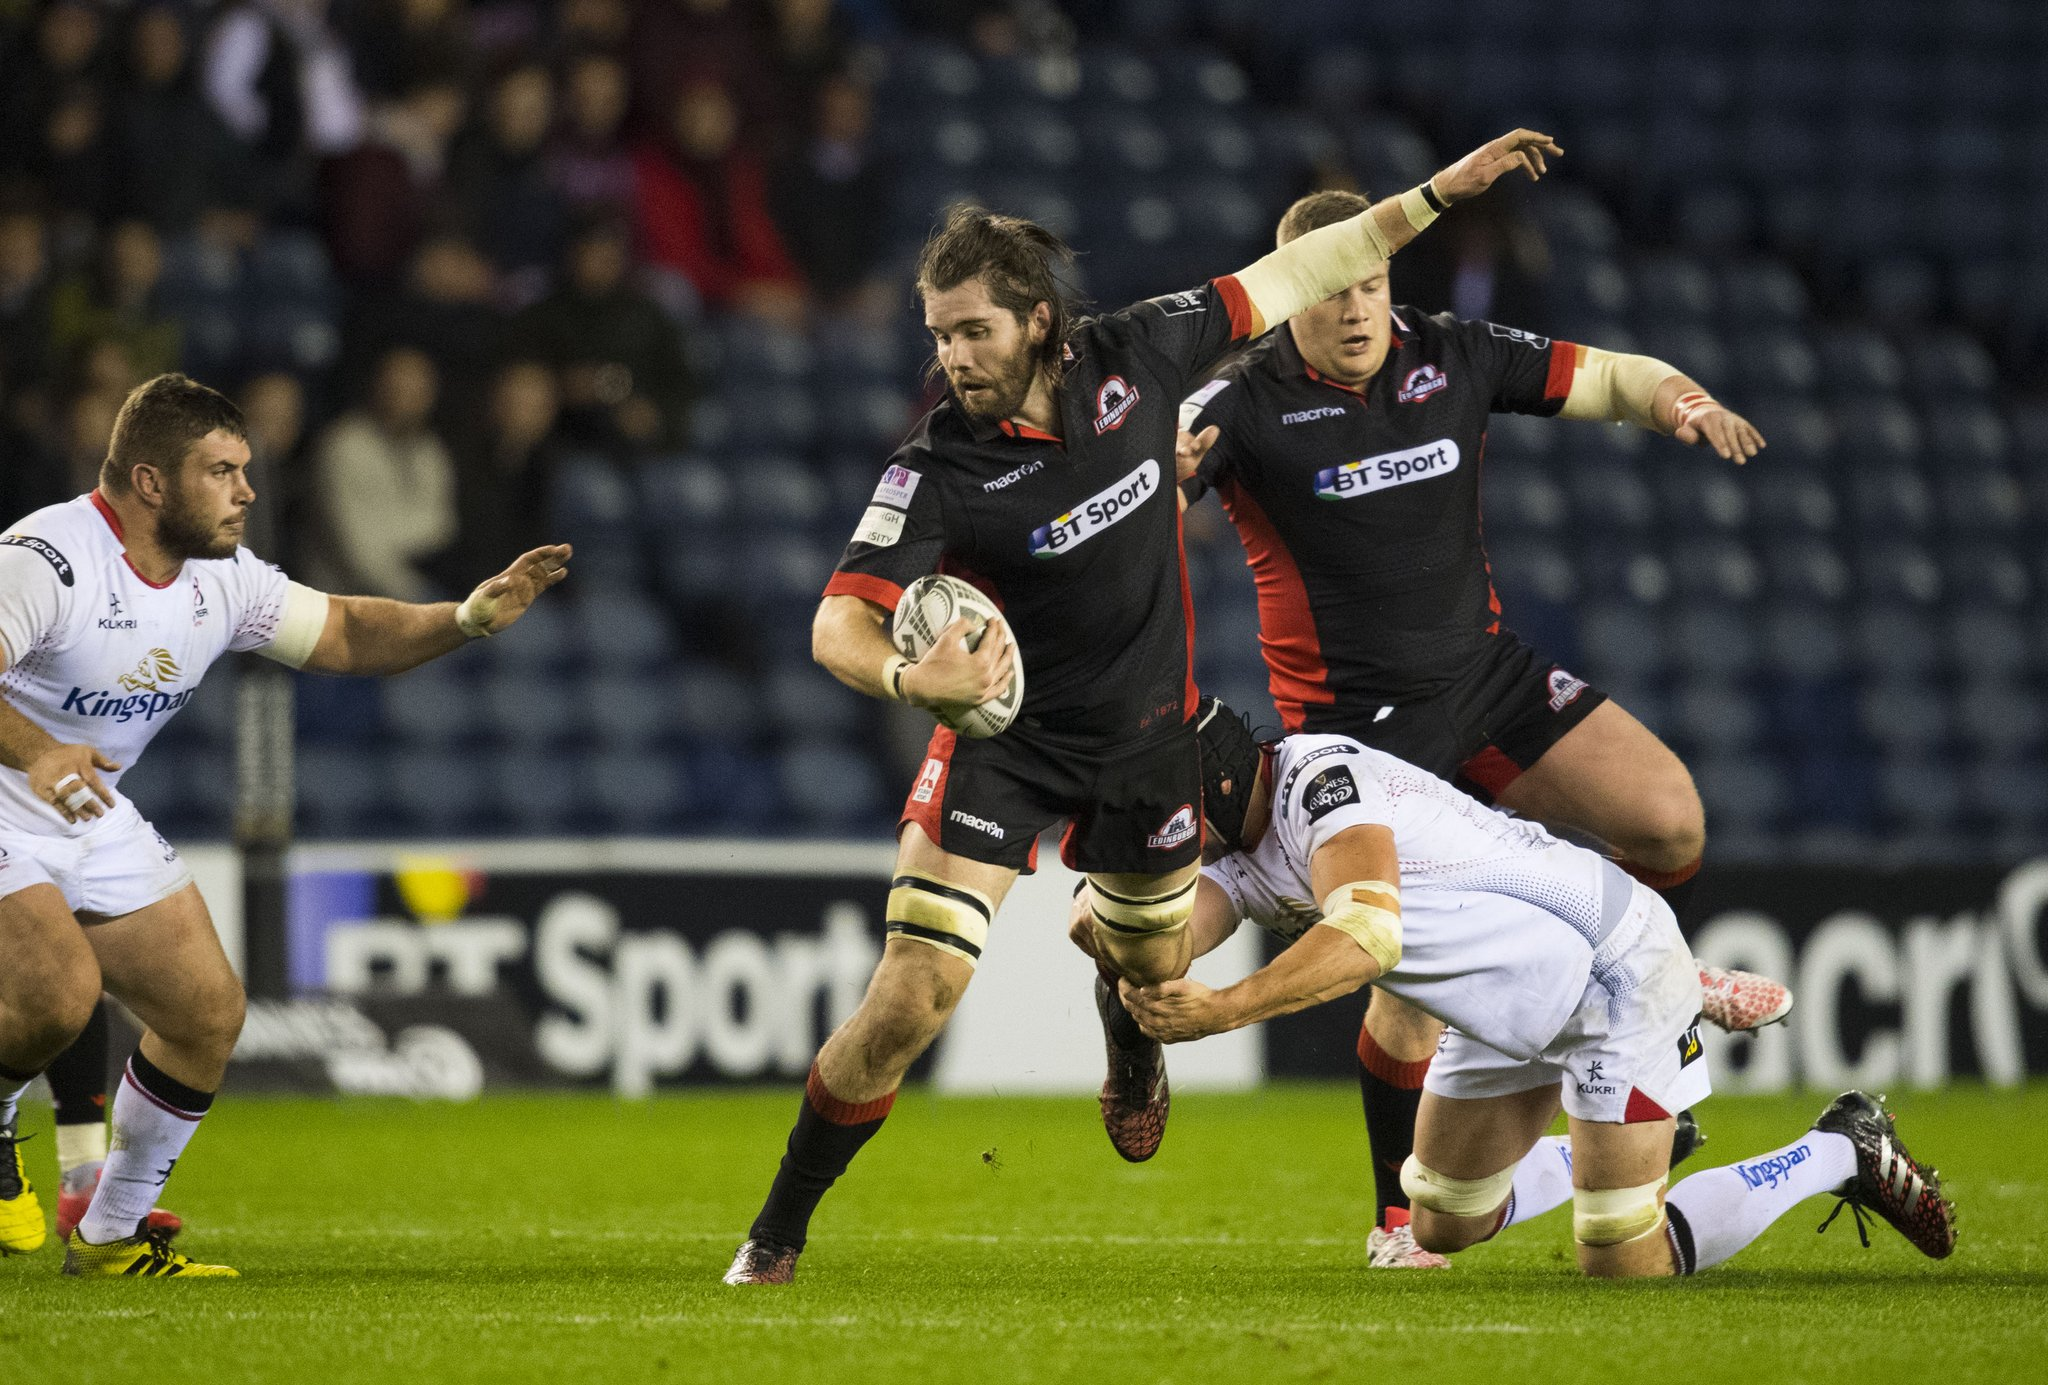 Edinburgh Rugby On Twitter Thursday 16 March Edinburgh Rugby